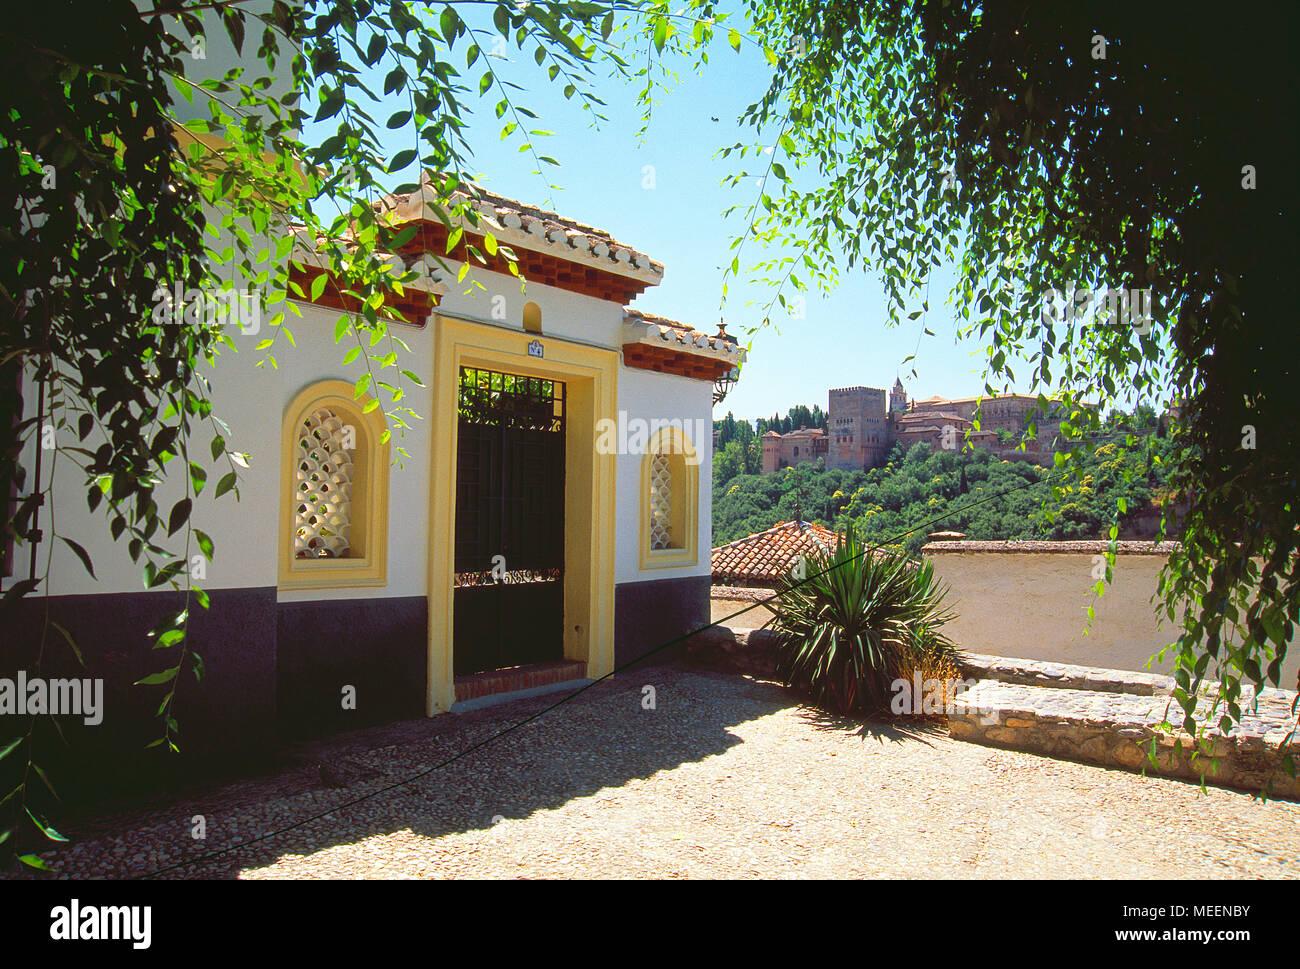 La Alhambra viewed from The Albayzin. Granada, Spain. - Stock Image